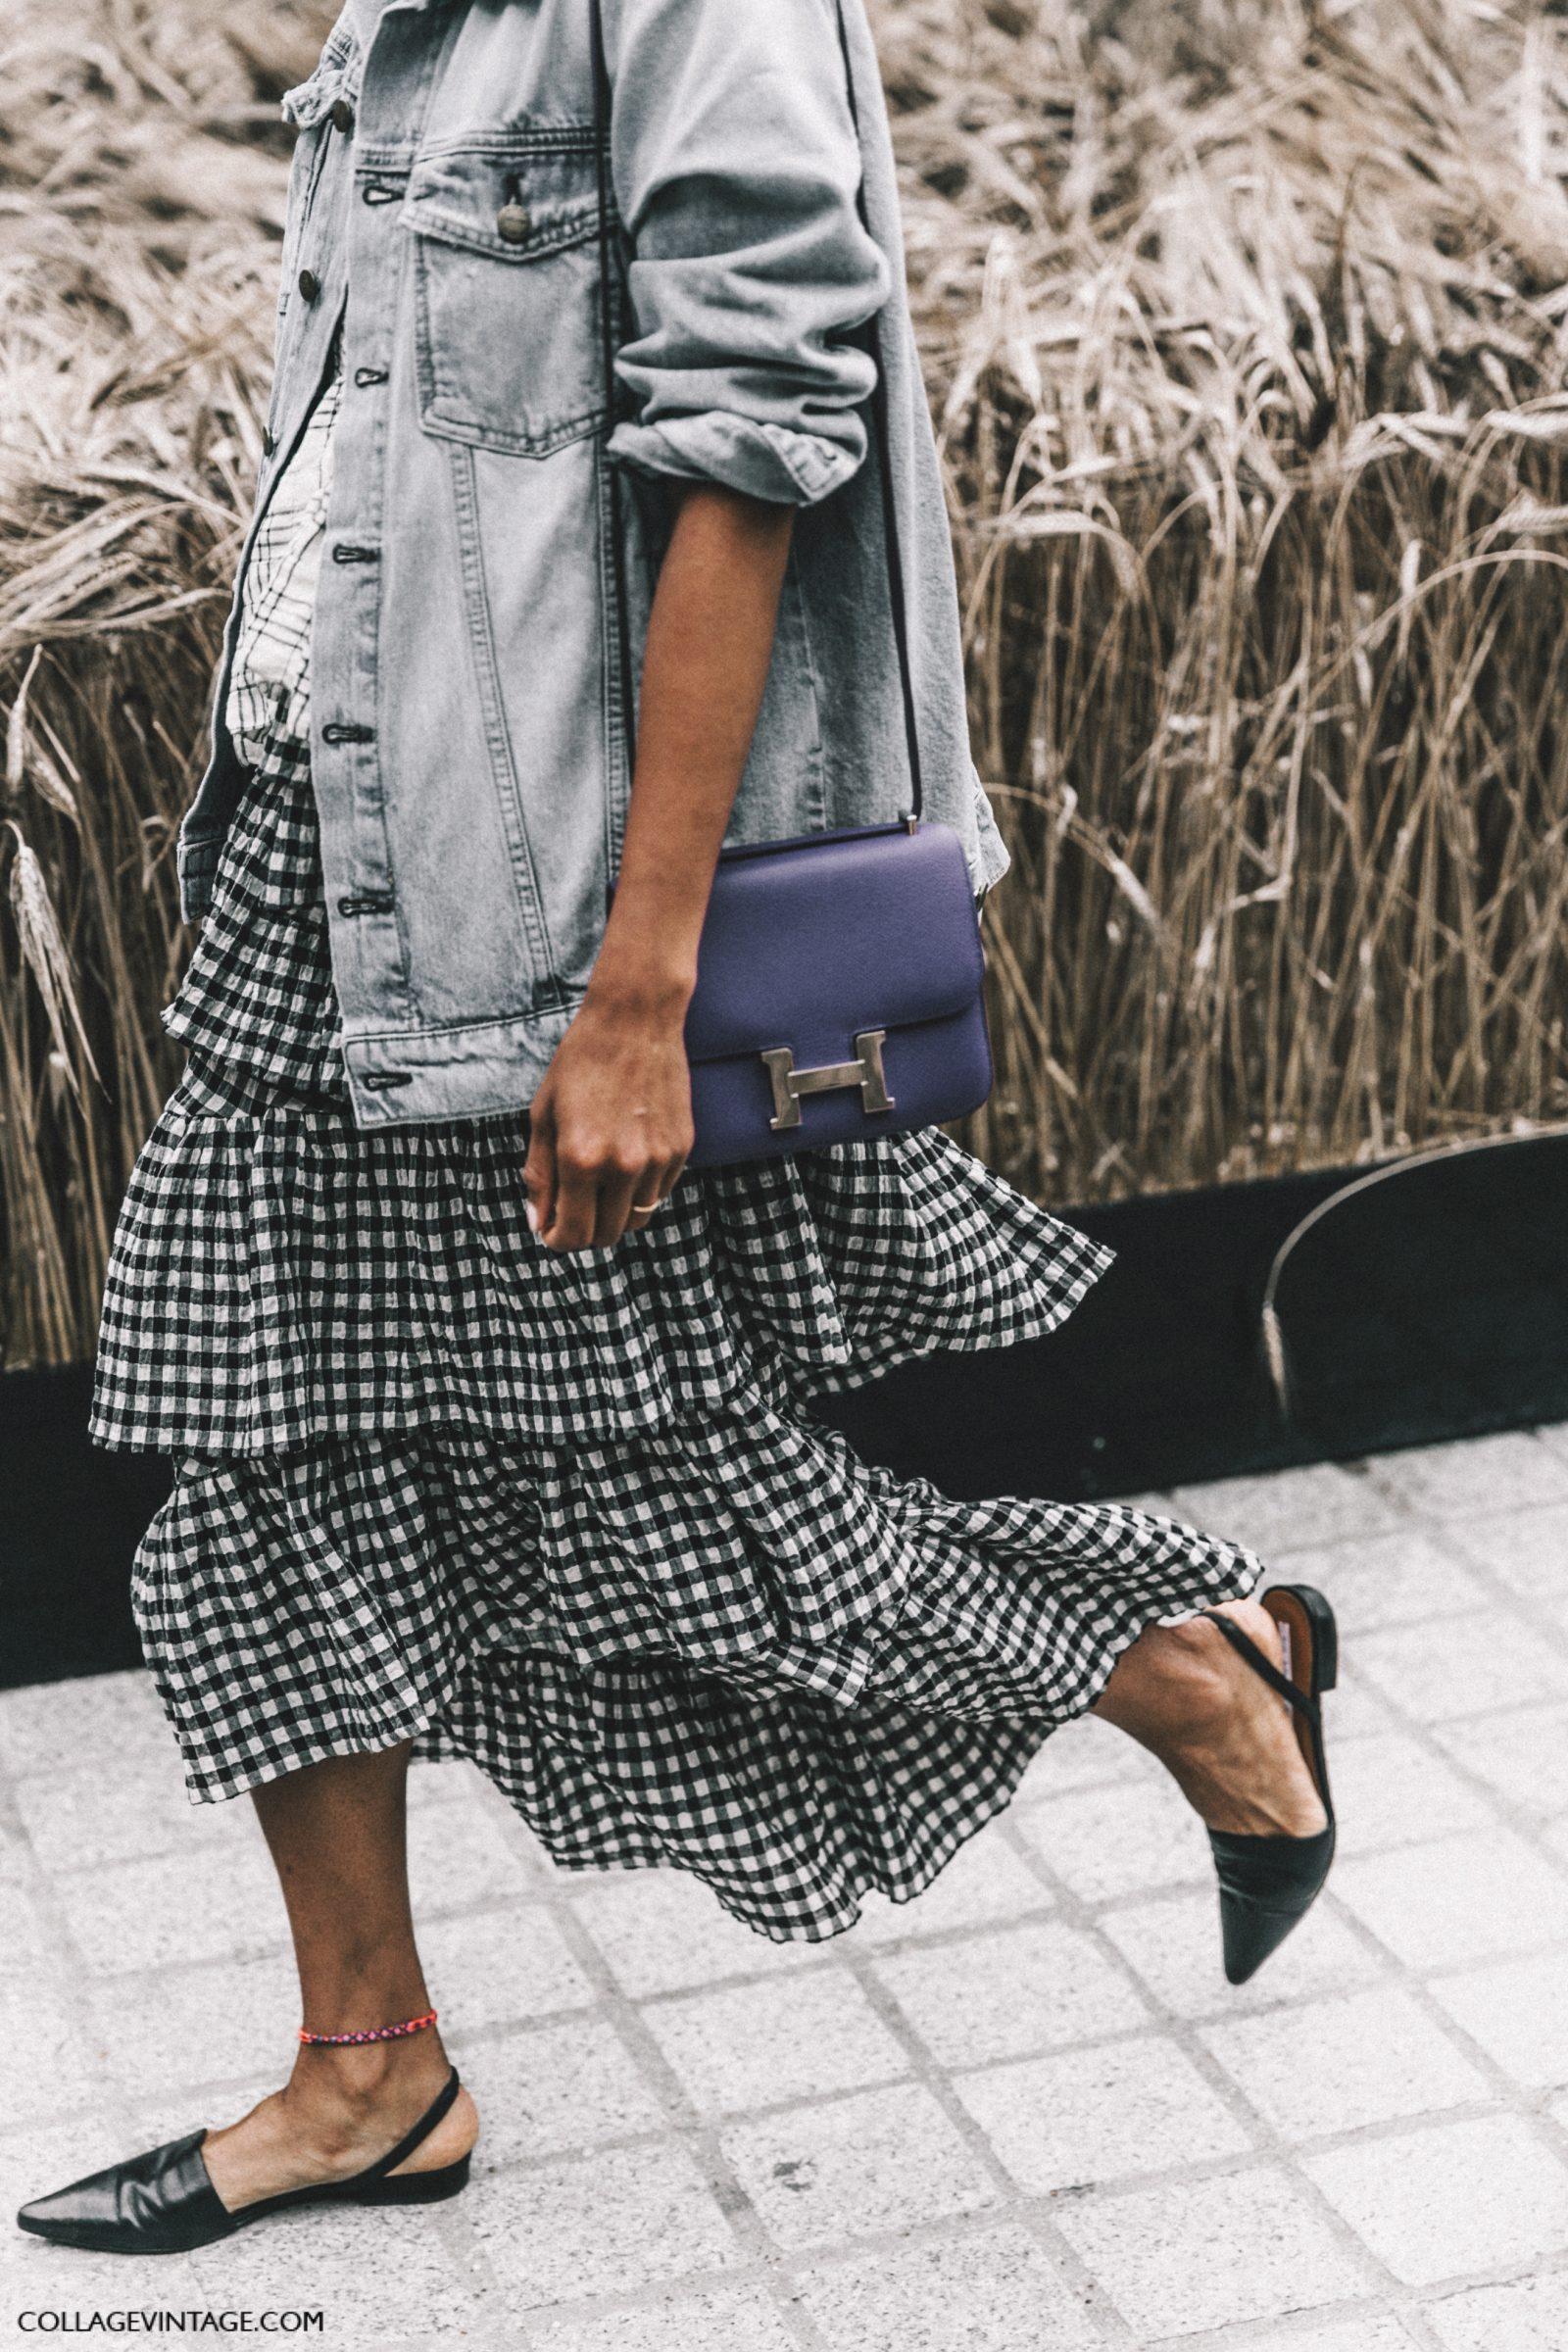 Paris_Couture_Fashion_Week-Collage_Vintage-Street_Style-39